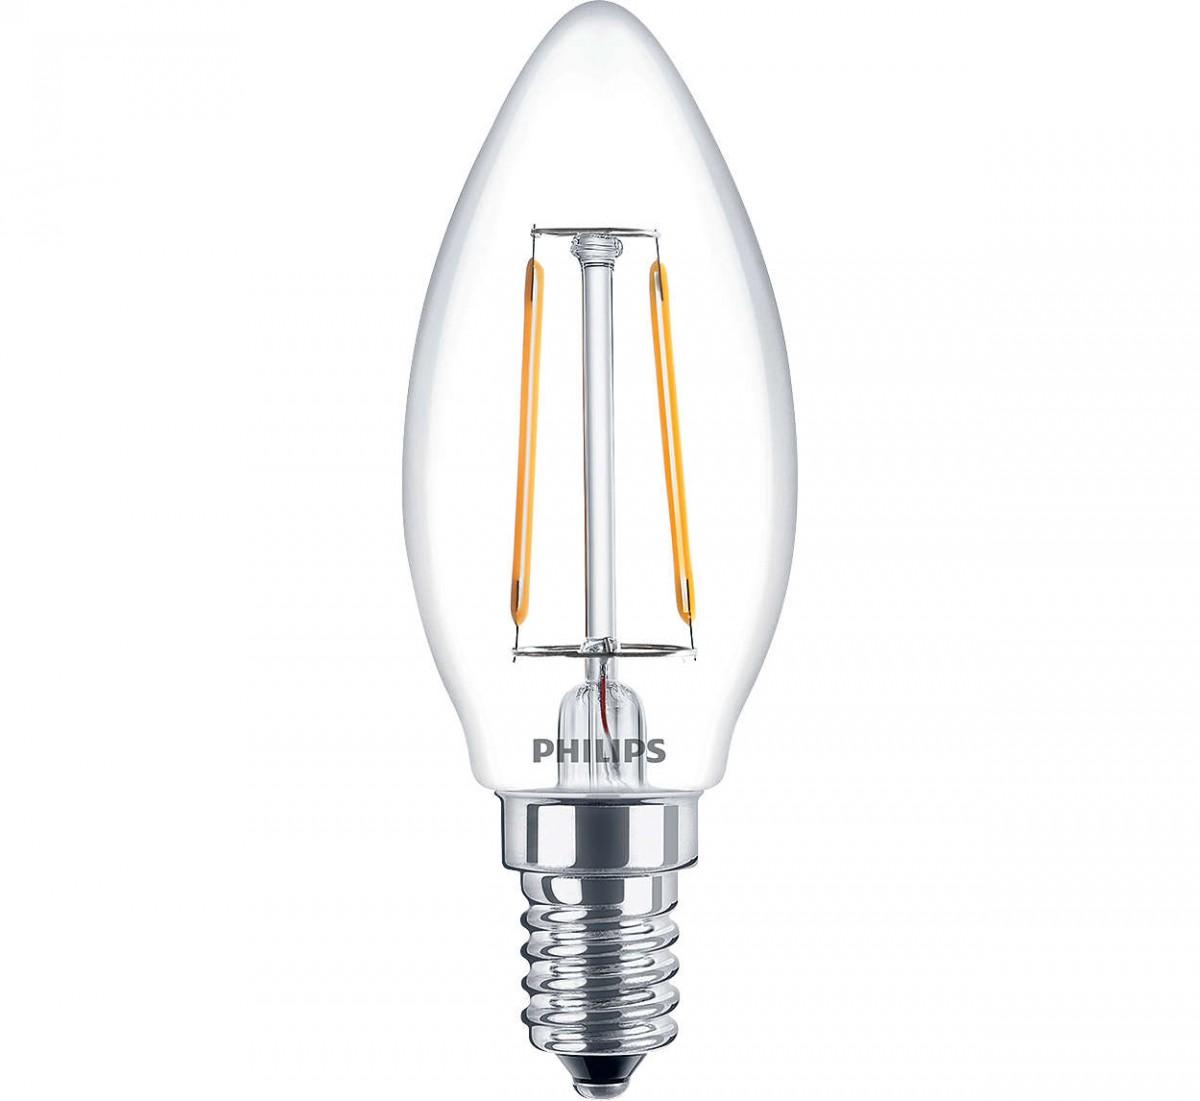 LED žárovka úsporná Philips 2,3W -> ekvivalent 25W E14 - Classic LEDcandle ND 2.3-25W E14 827 B35 CL